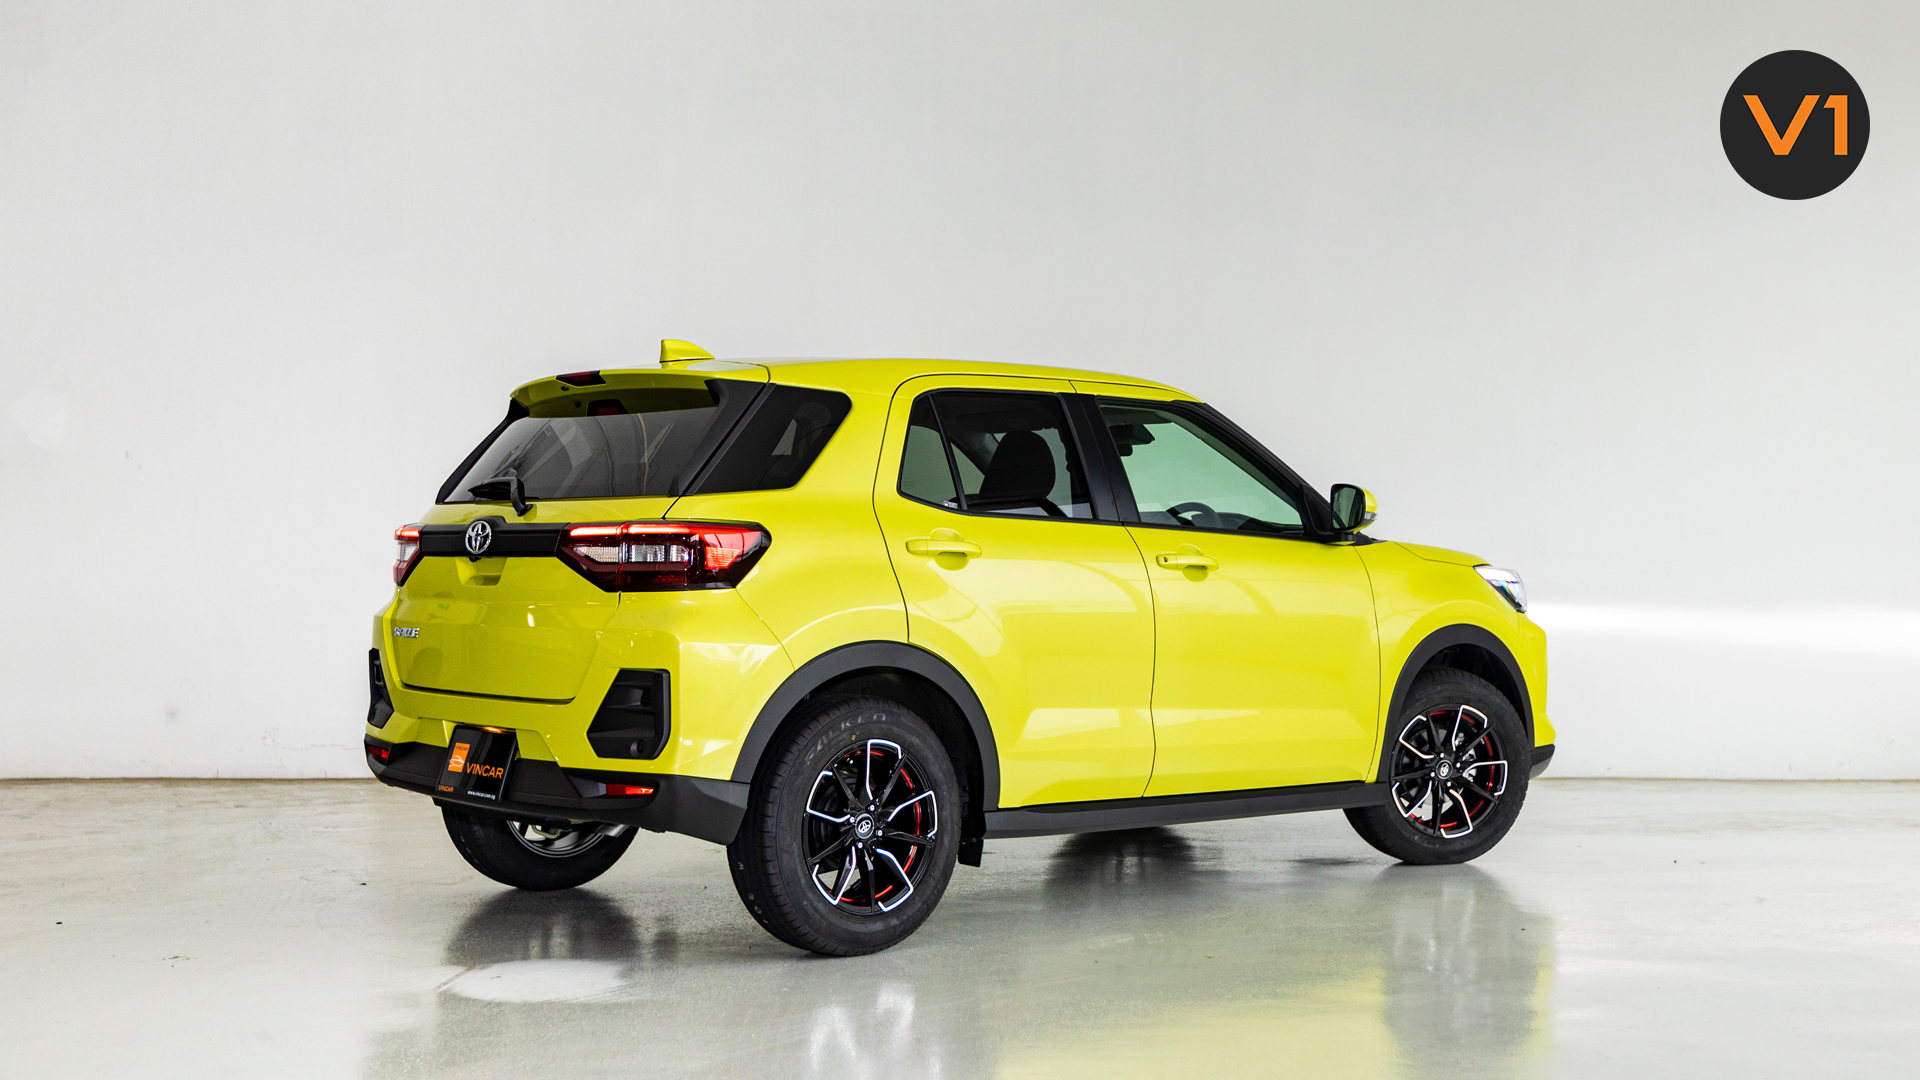 Toyota Raize 1.0 XS - Rear Angle